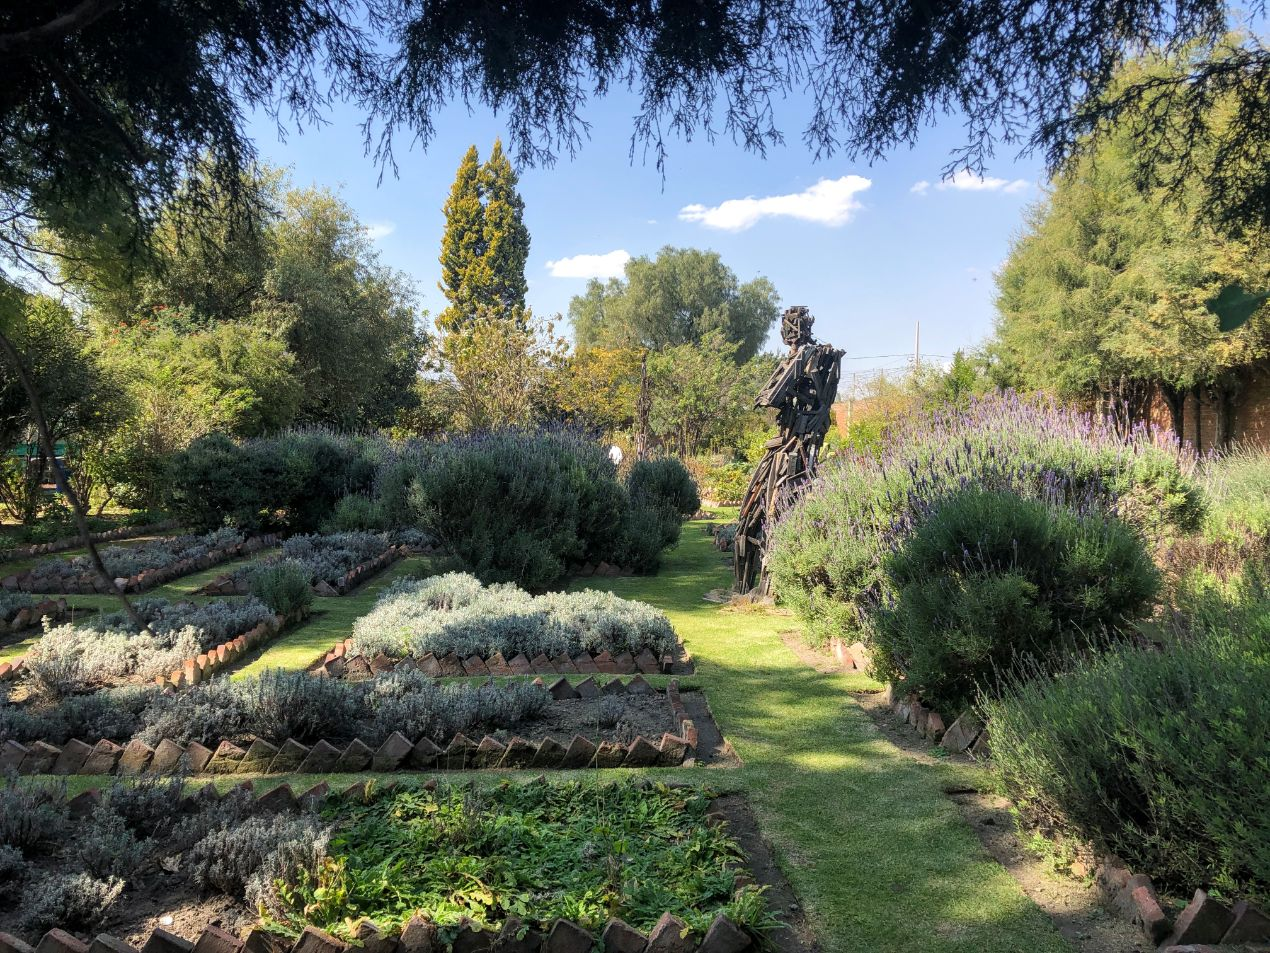 Cholula Botanical Garden